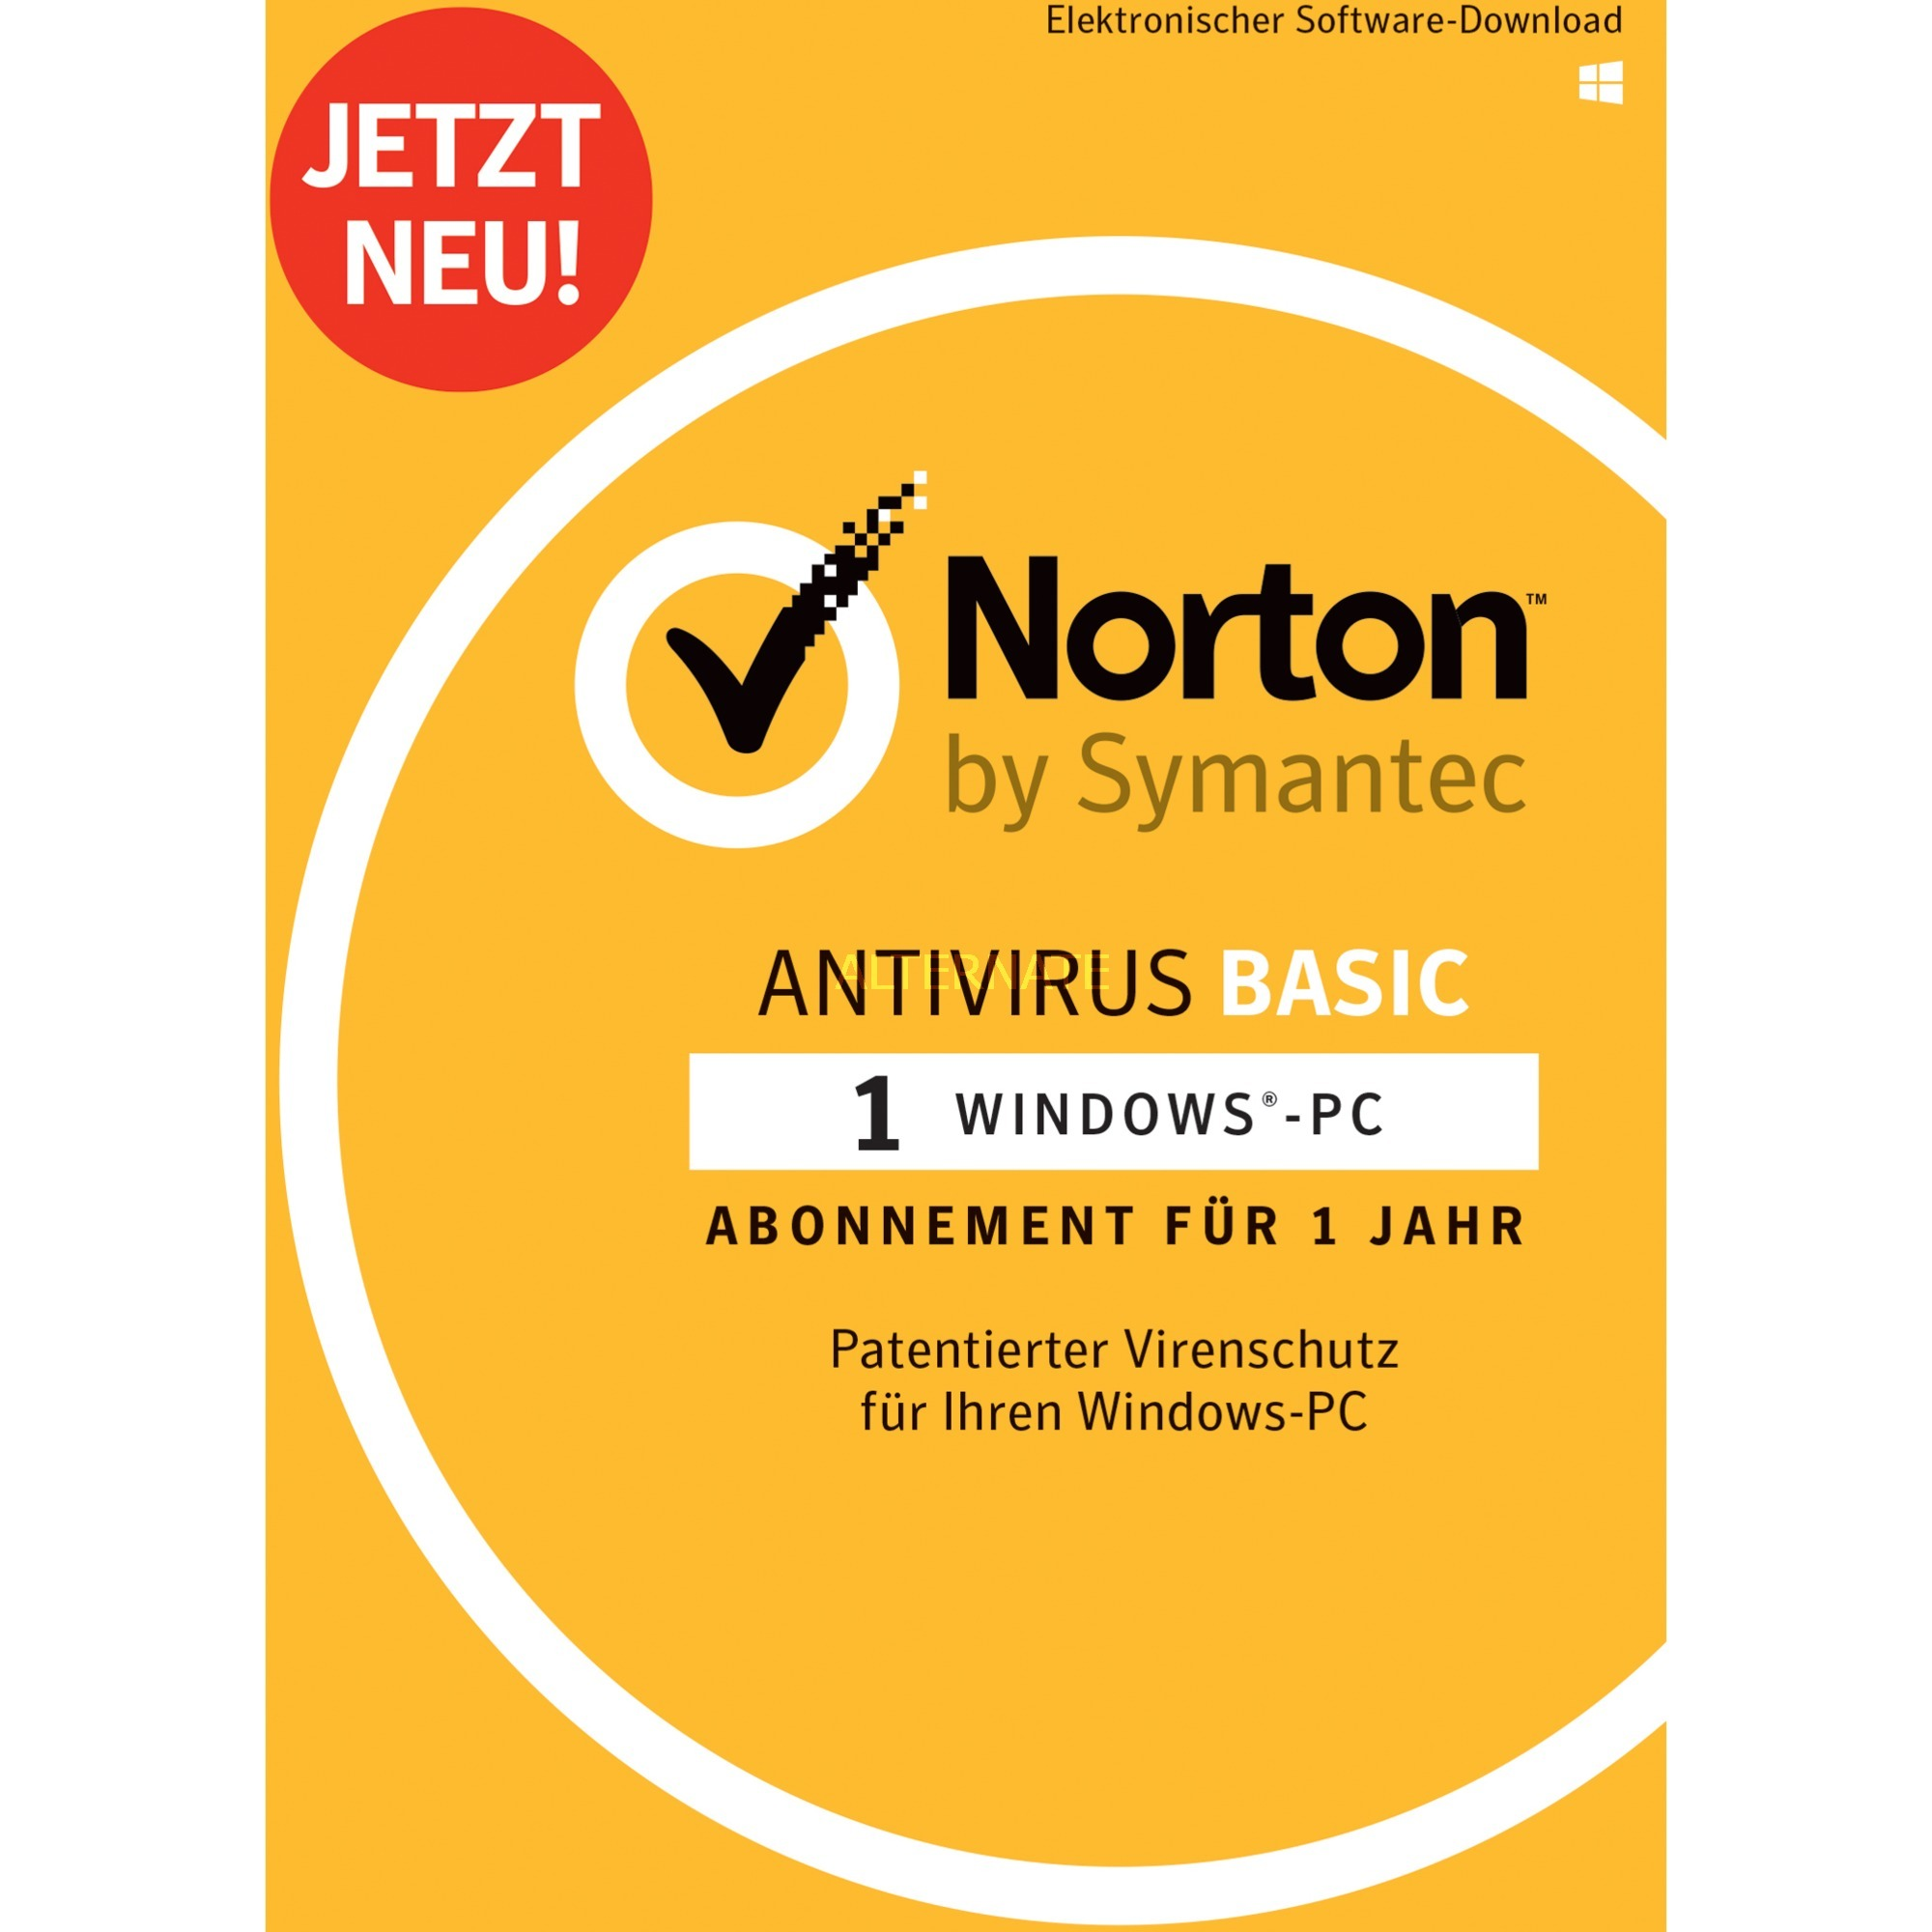 Antivirus Basic 1D, Software